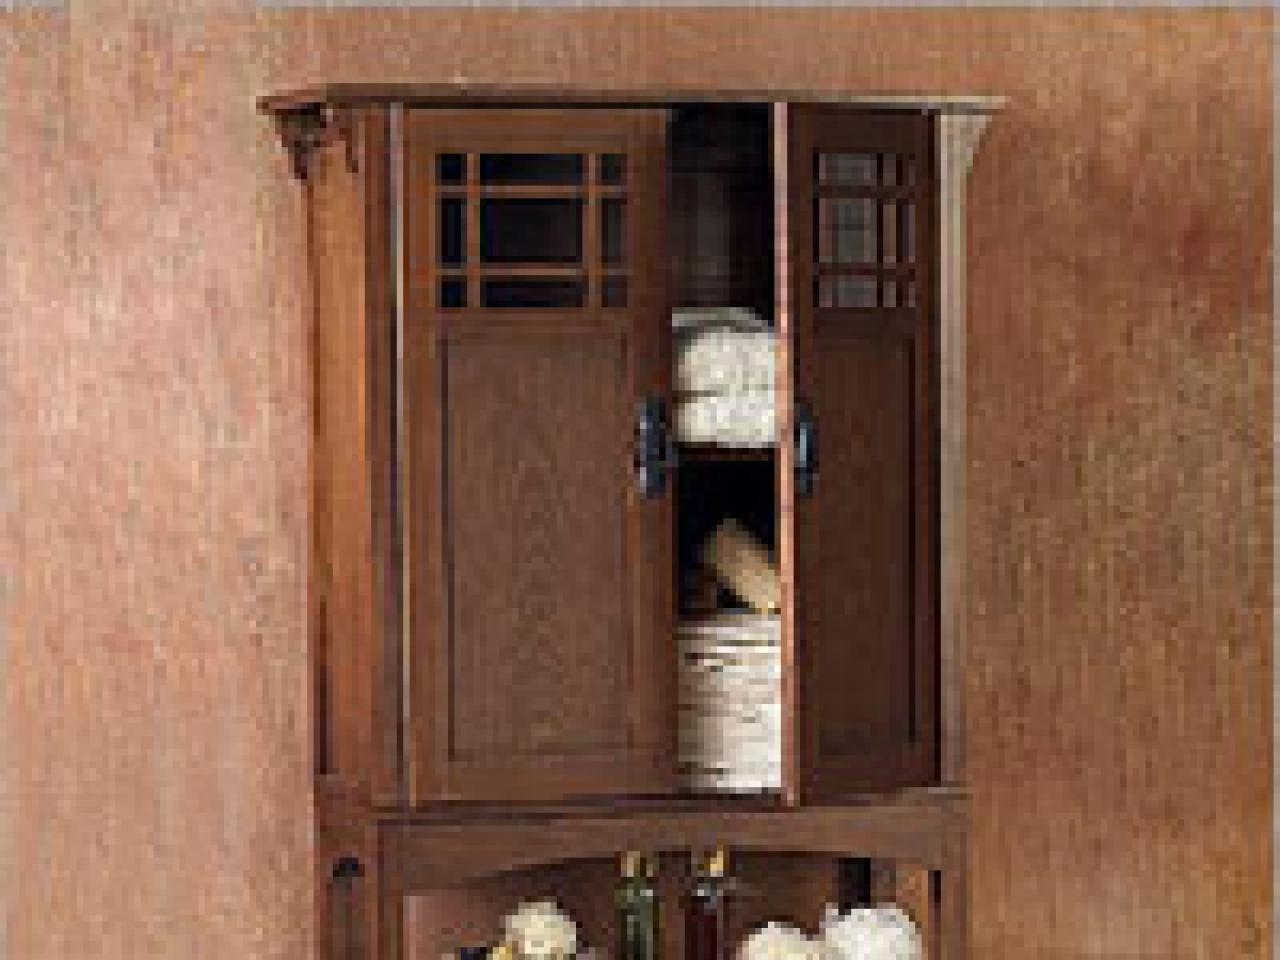 bathroom etageres etageres_storage_with_style_bathrk_1 EVQMRMX